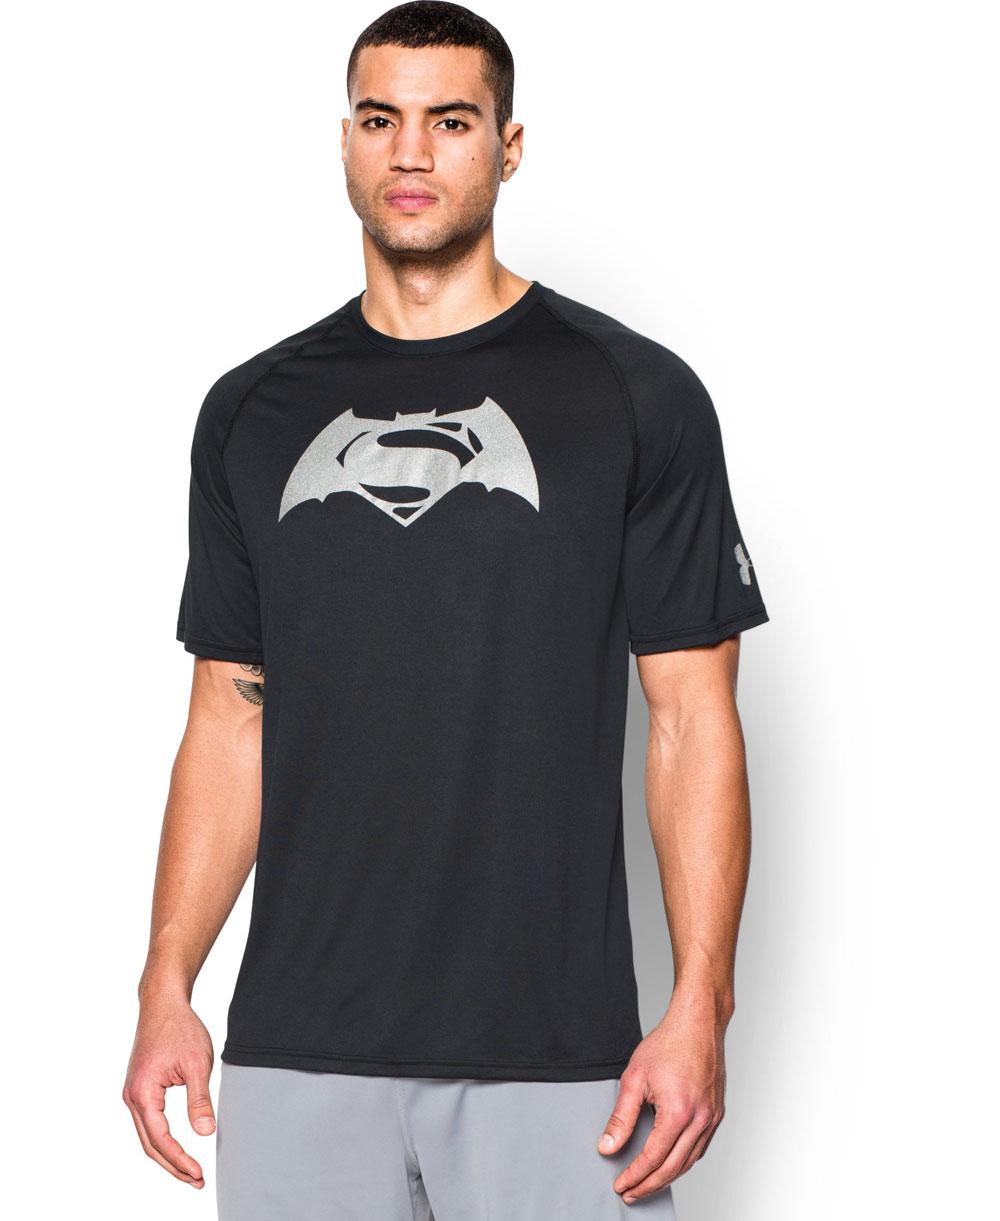 Alter Ego Batman Vs Superman Camiseta Manga Corta para Hombre Black